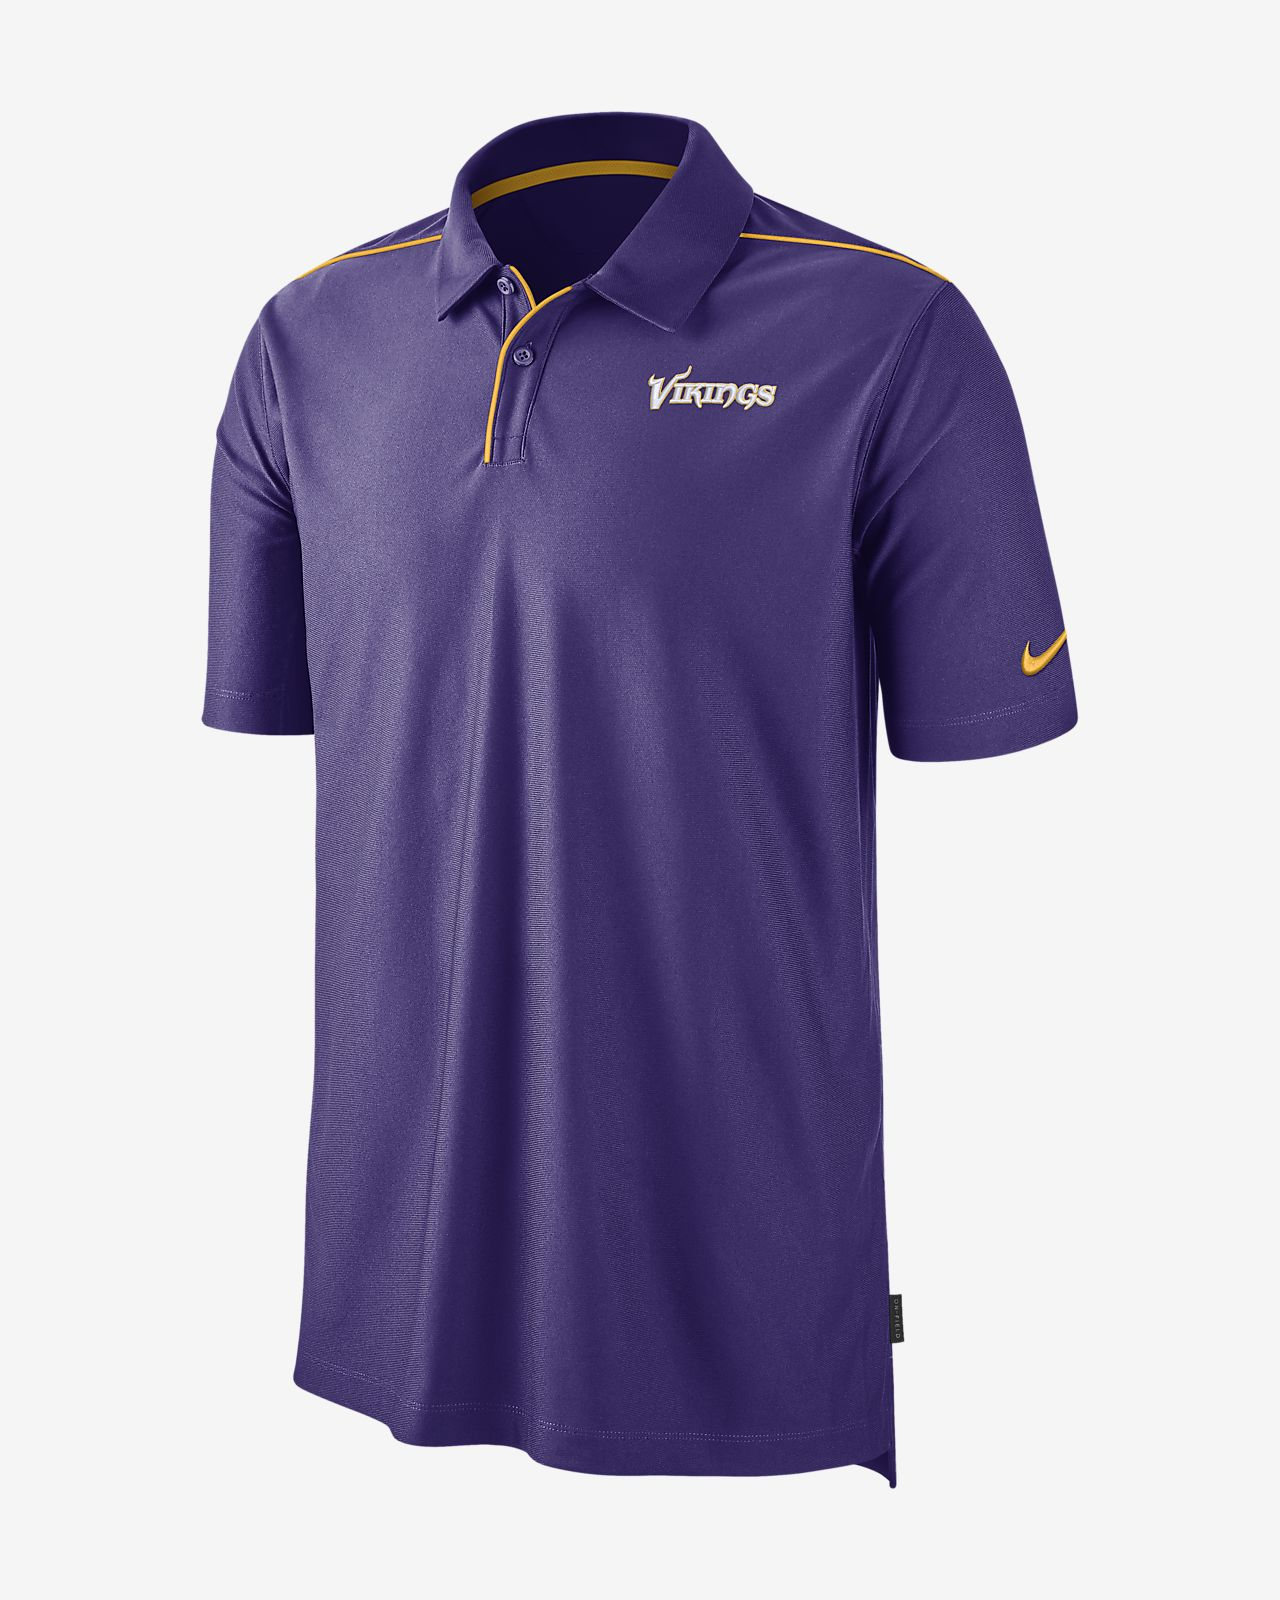 Nike Dri-FIT Team Issue (NFL Vikings) Men's Polo